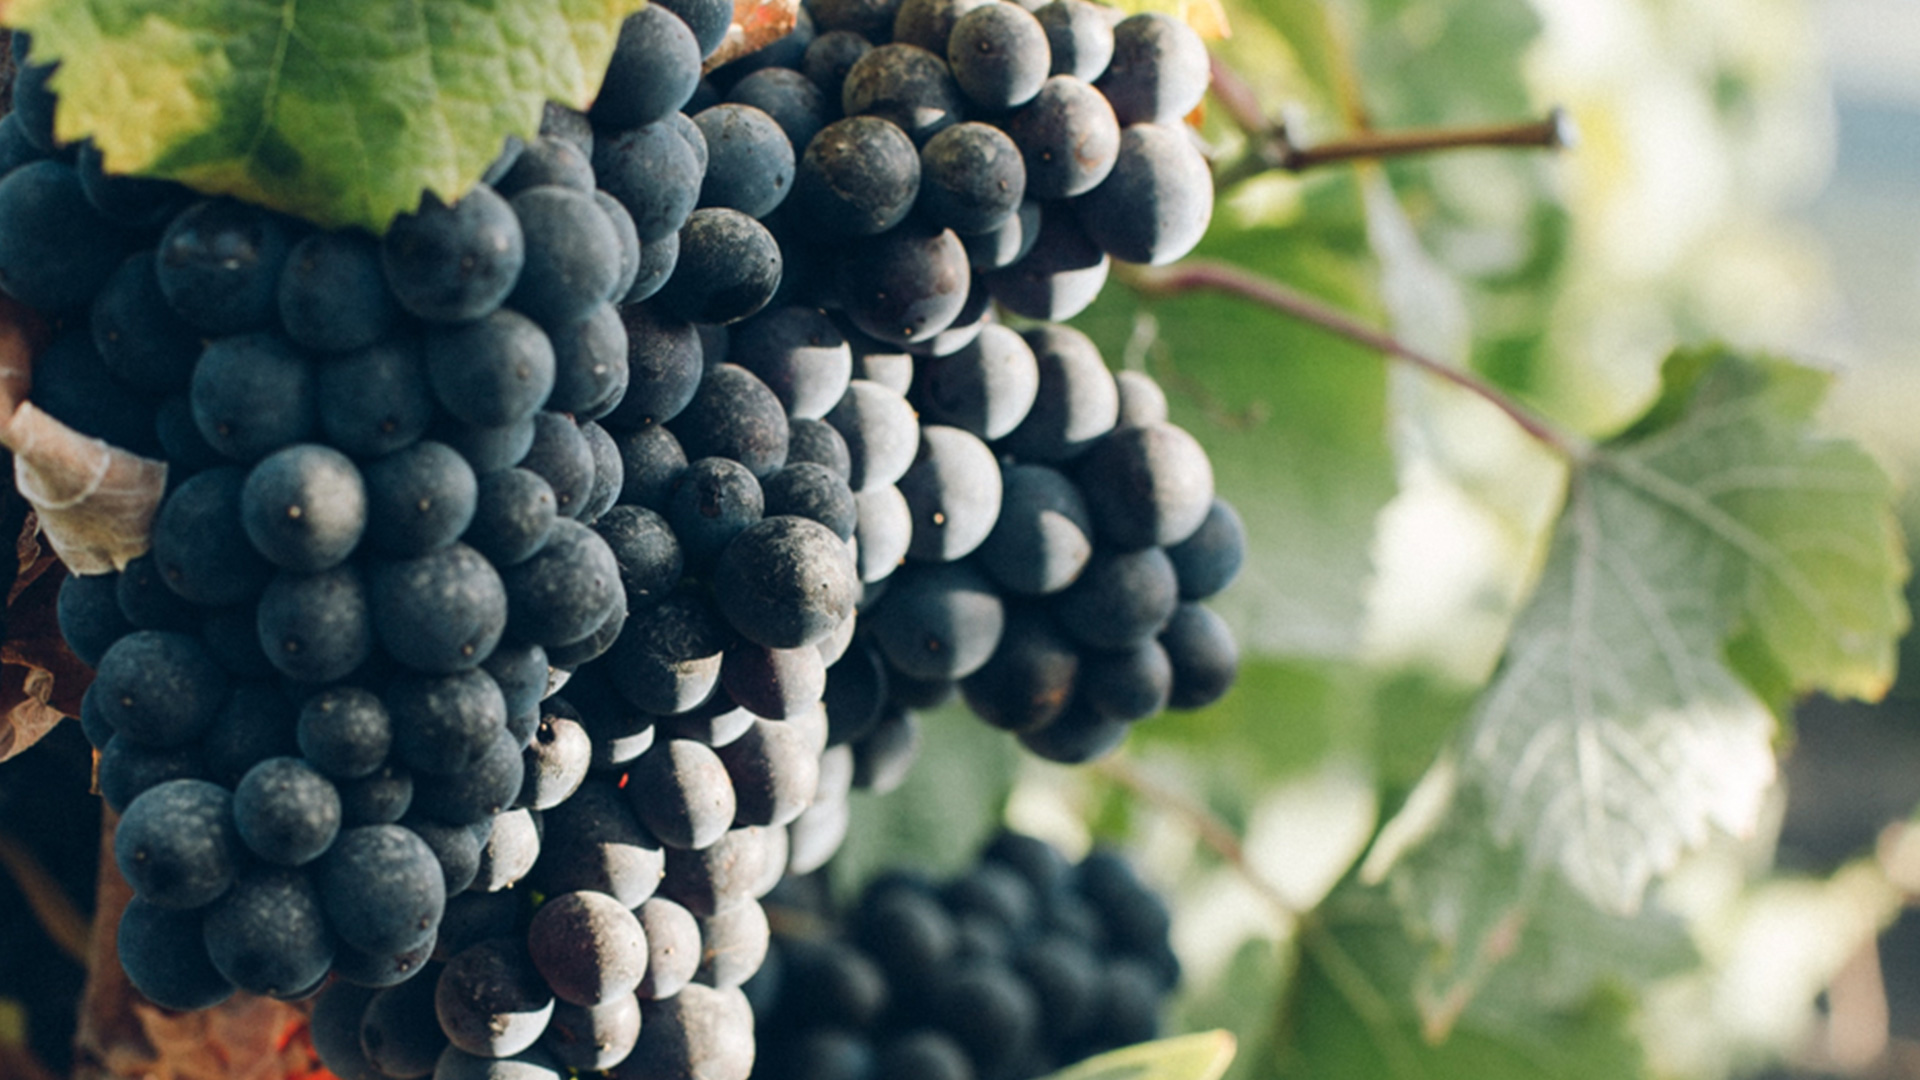 spinefrasse-vino-colli-euganei-cantina-slider4